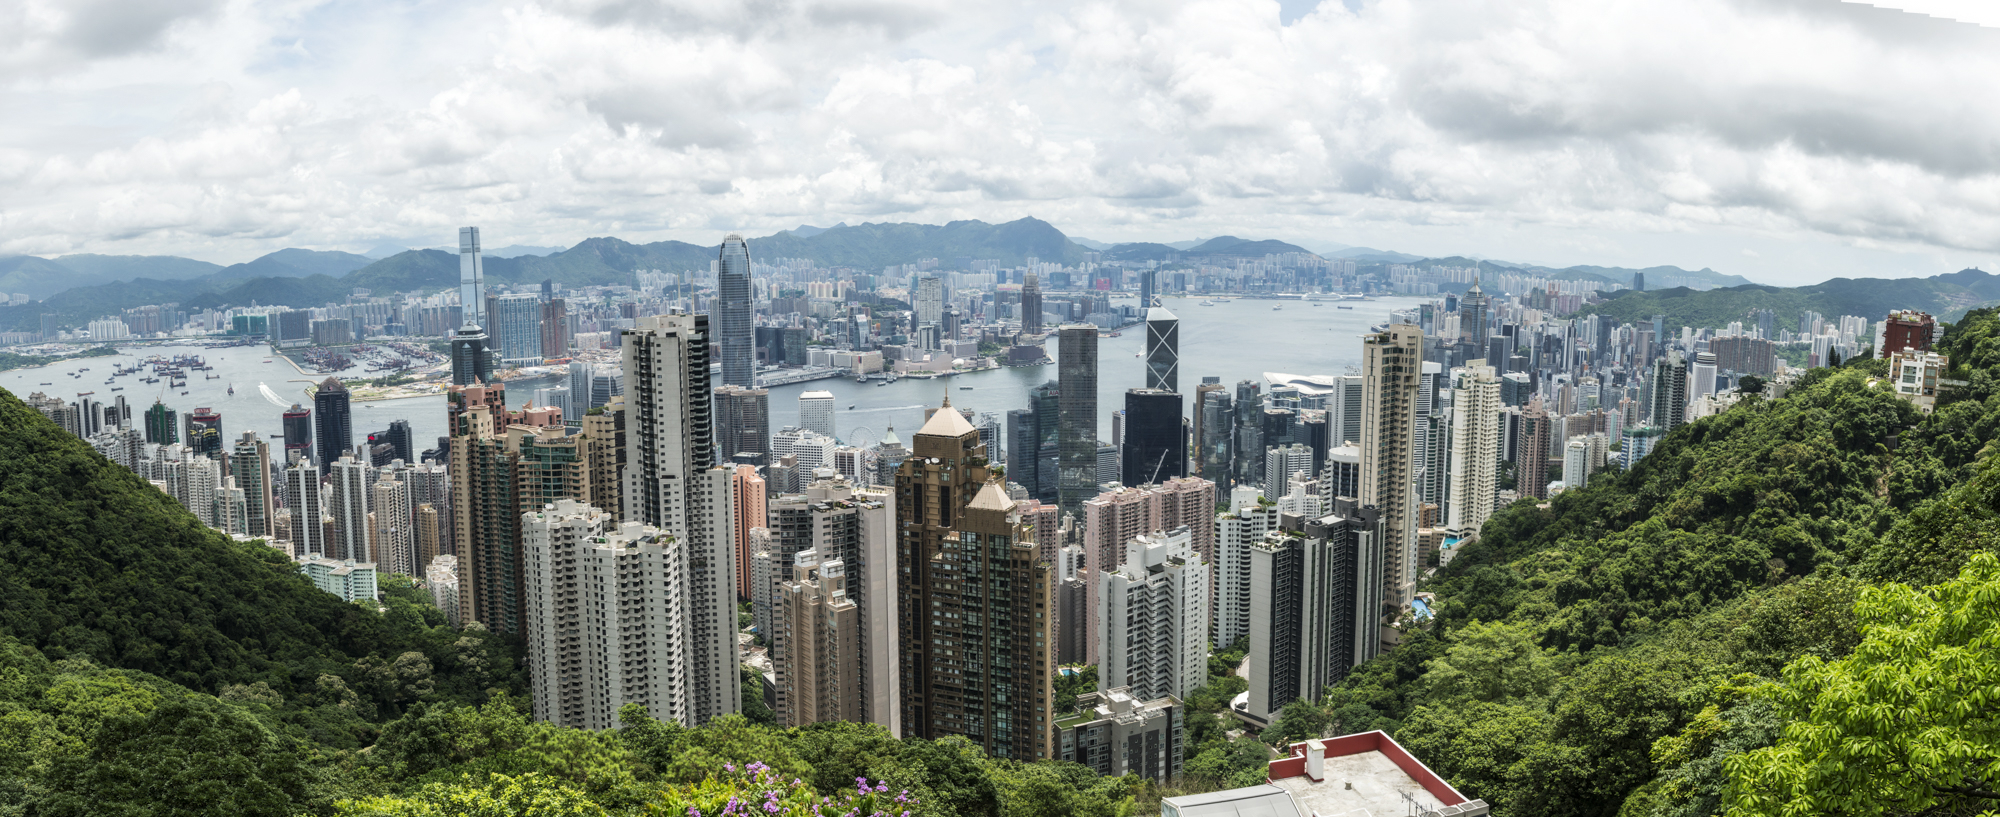 Hong_Kong-7.jpg